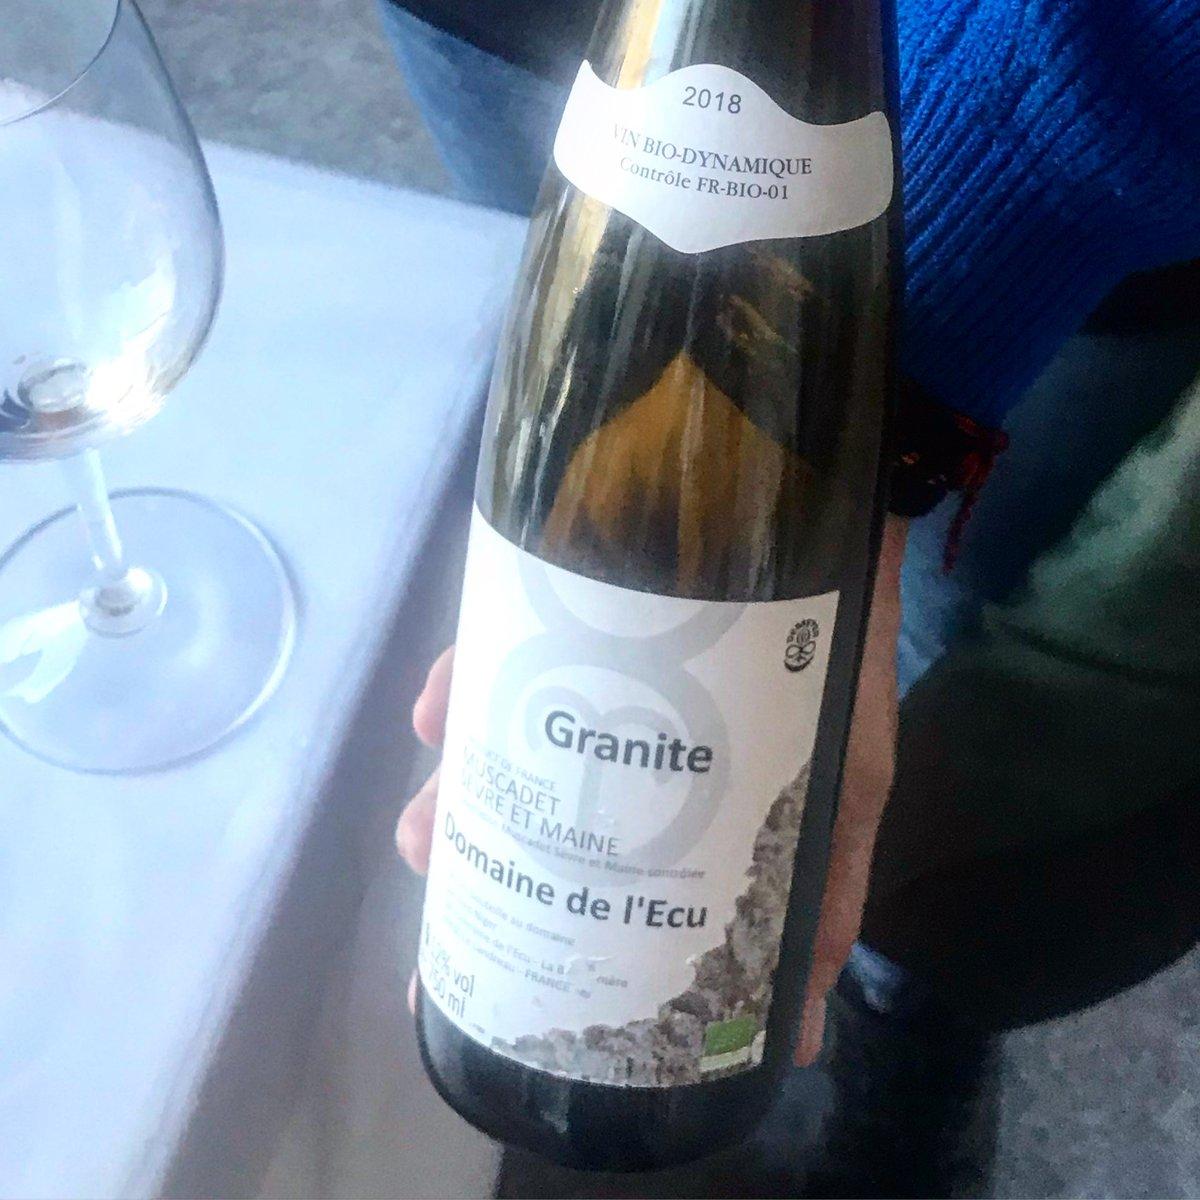 We tested the biodynamics of Domaine de l'Ecu. Mineral freshness of the Loire, France.  https://www.decantalo.com/en/wine/winery_domaine-de-lecu/…  #vilaviniteca #wine #winelover #loira @vilaviniteca #lamusicadelvi #frenchwine #biopic.twitter.com/TrjyipVJjq